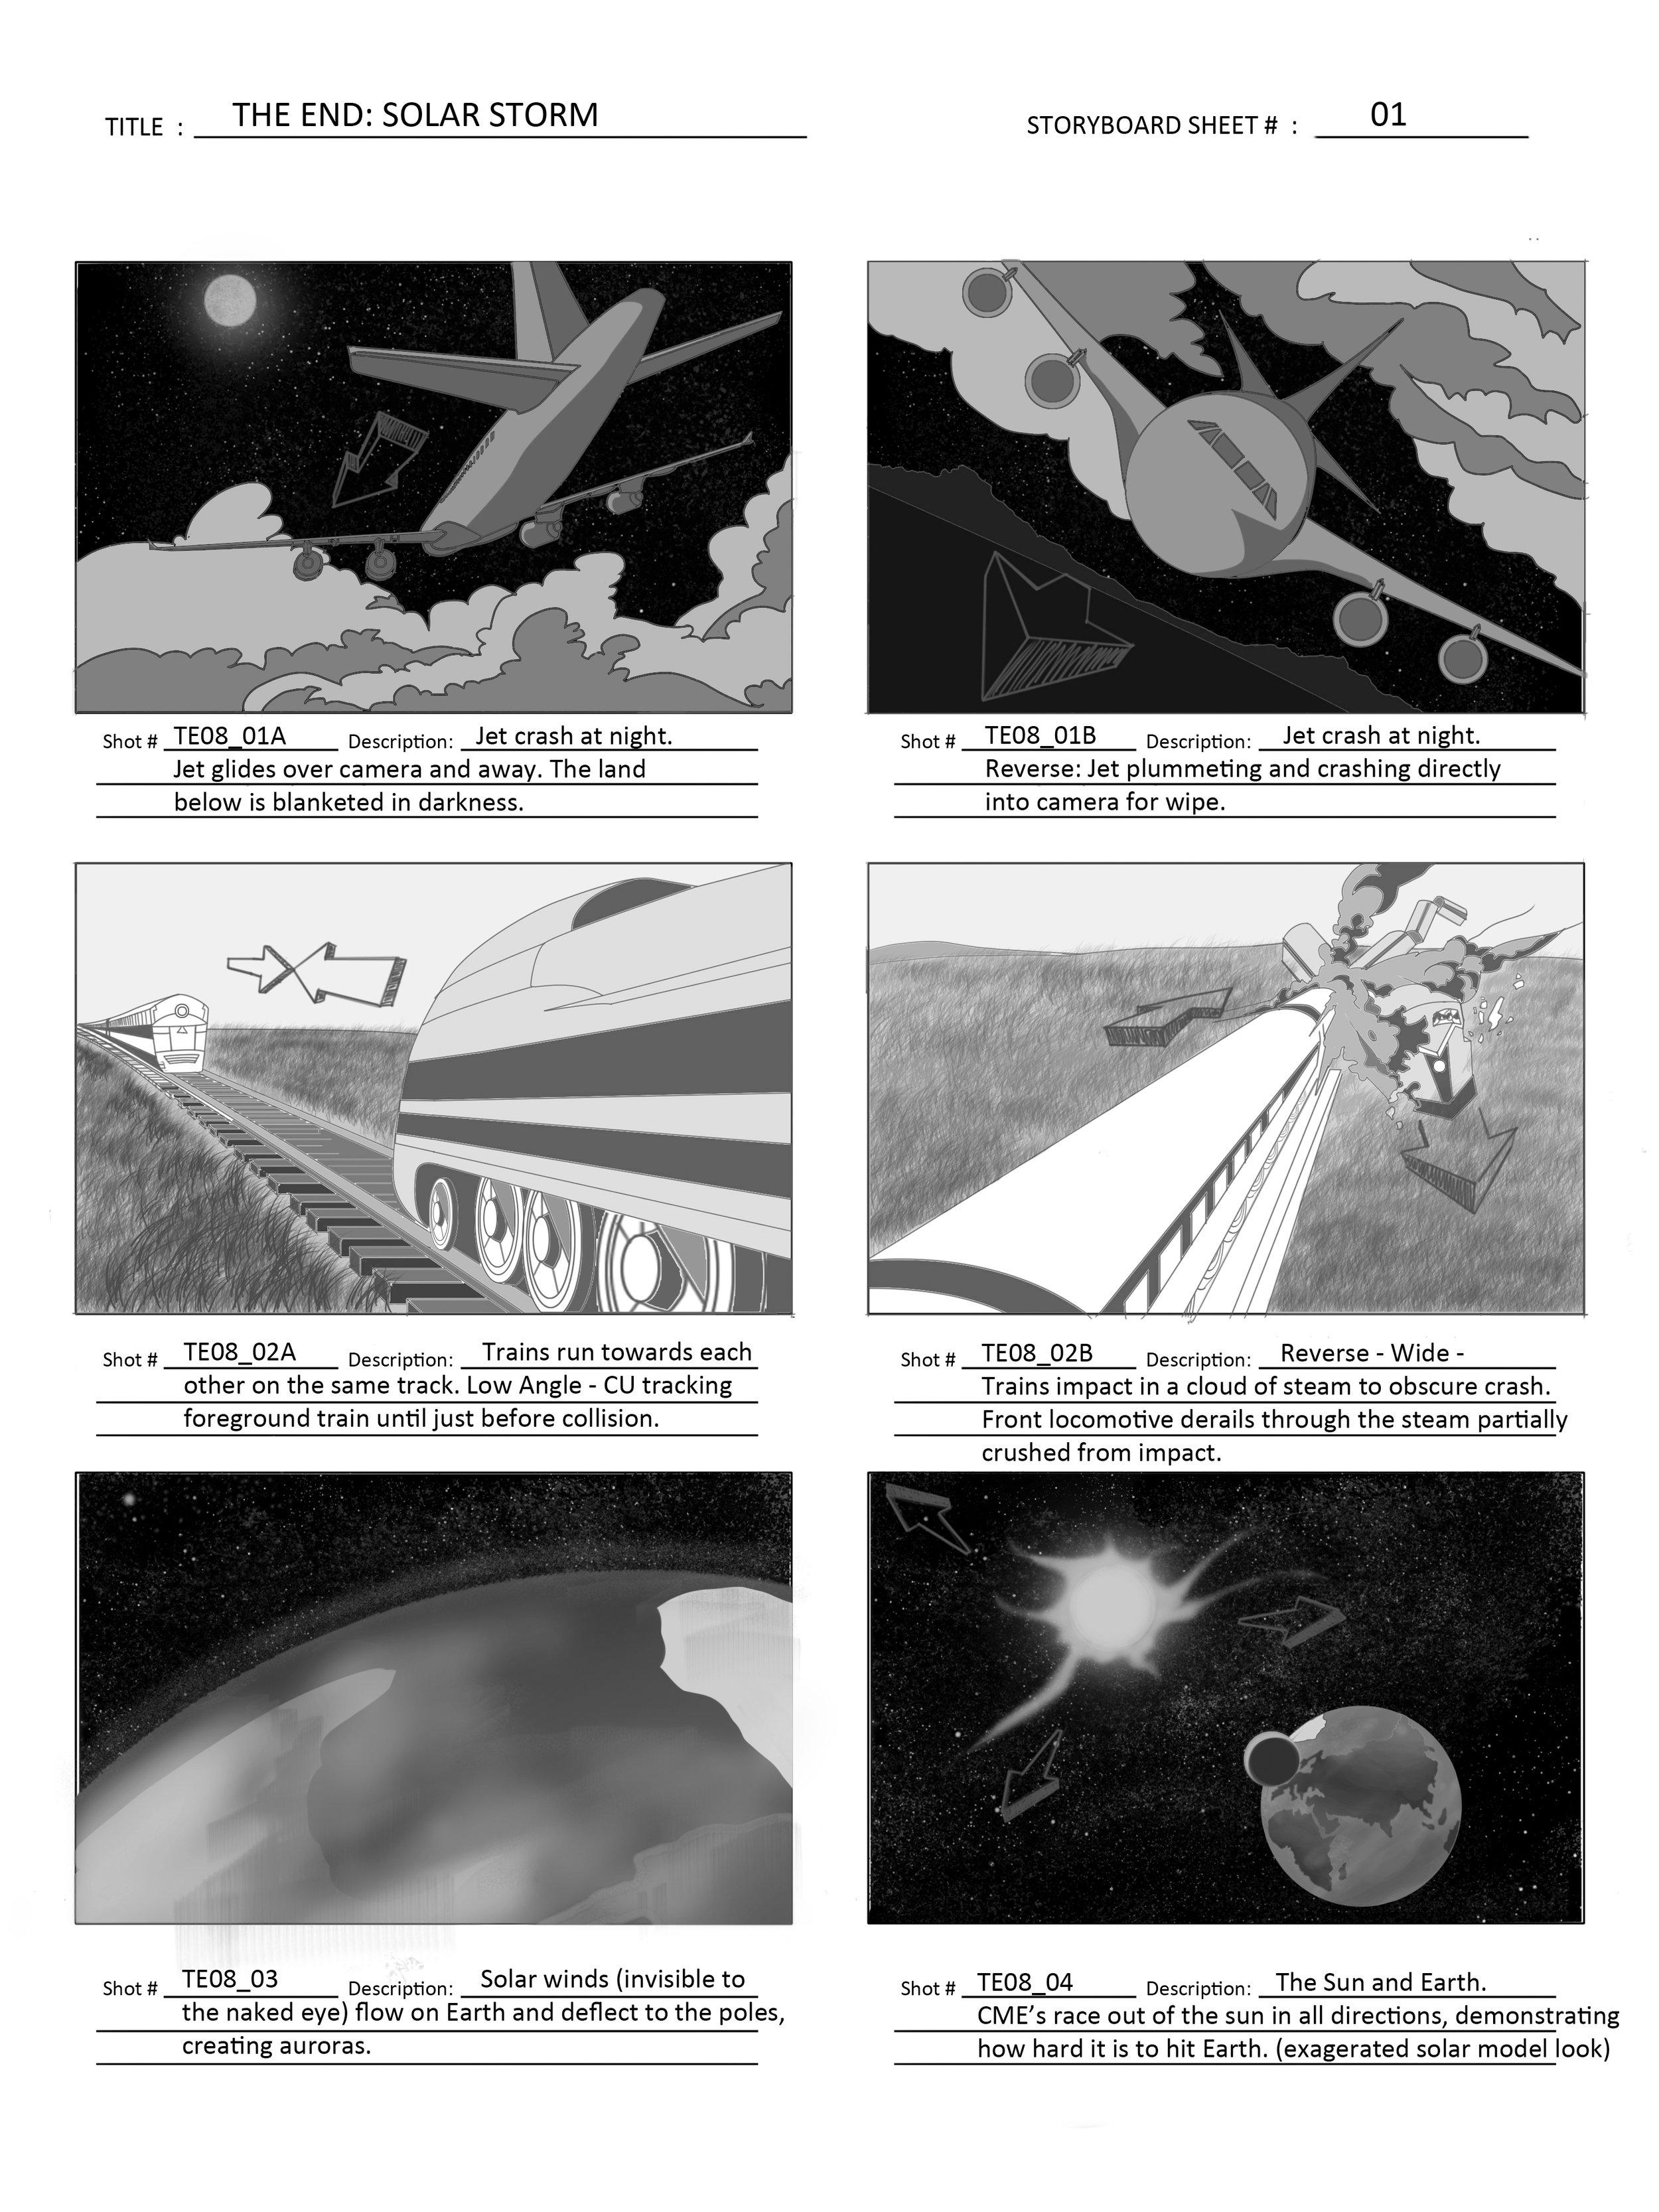 TE08_Solar Storm Storyboard_Digital Revision_Page 01.jpg